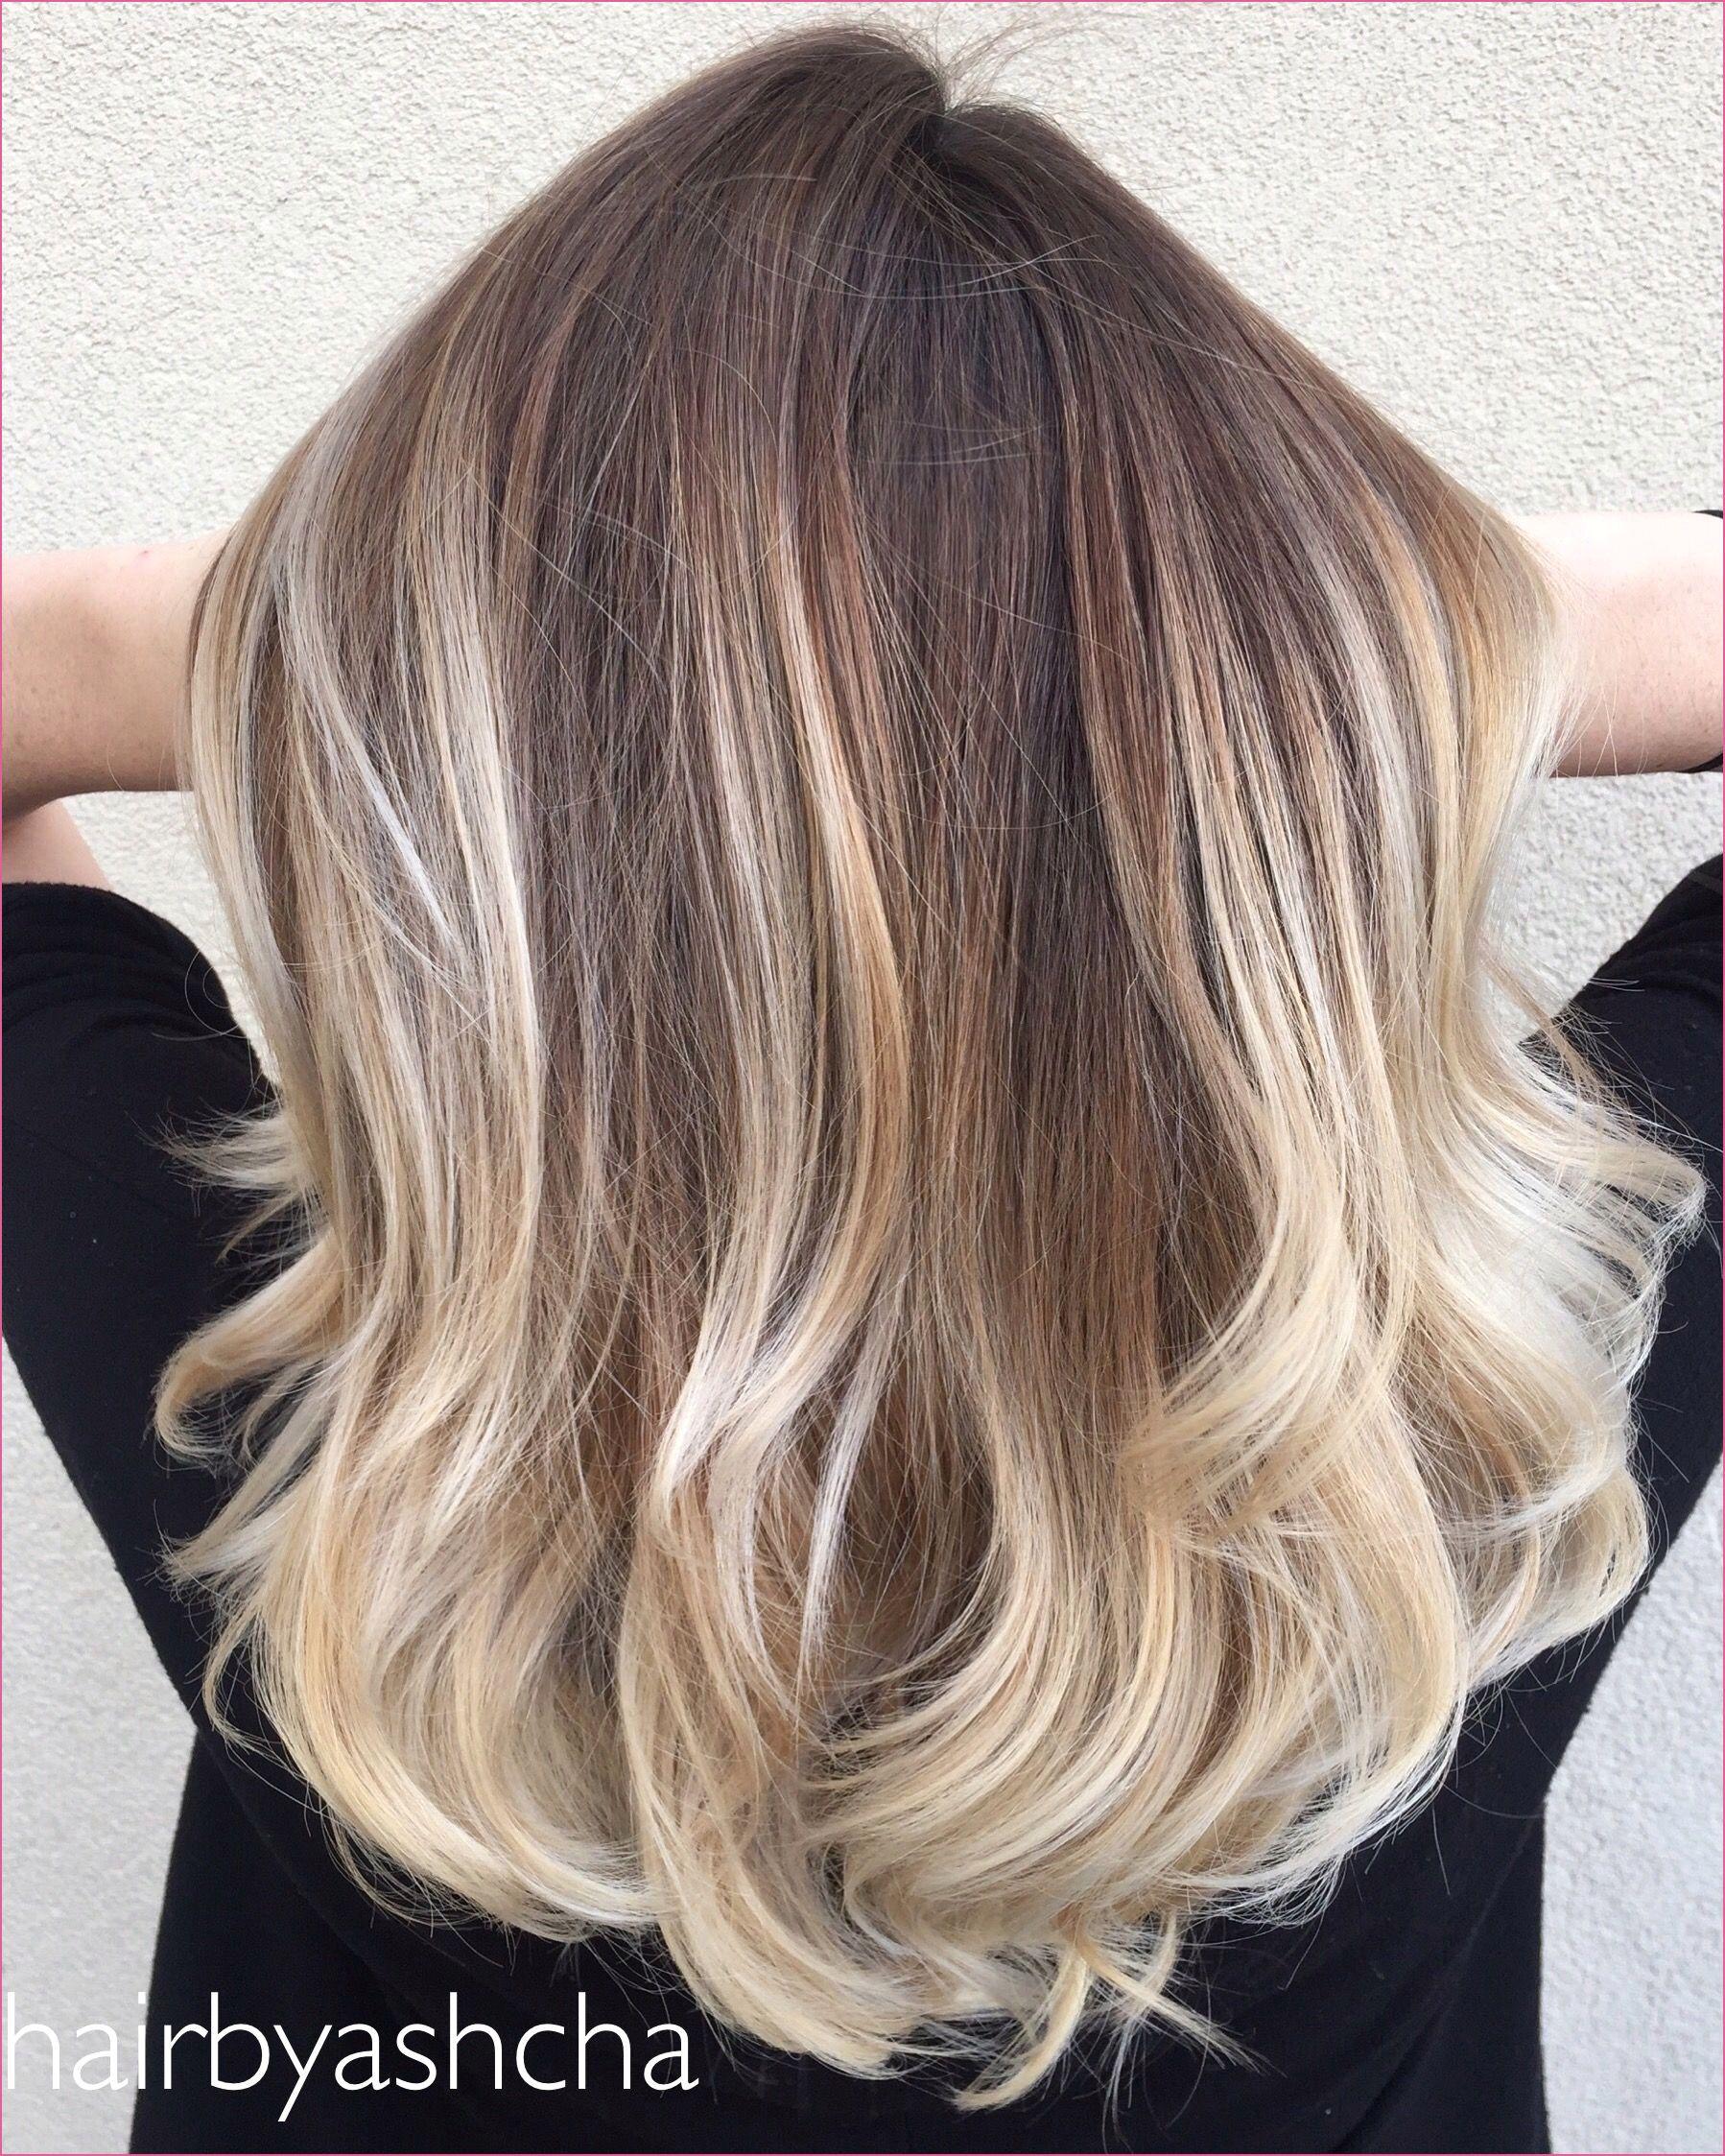 Frisuren Blond 9  Frisuren blond, Haarschnitt, Ombré haare färben